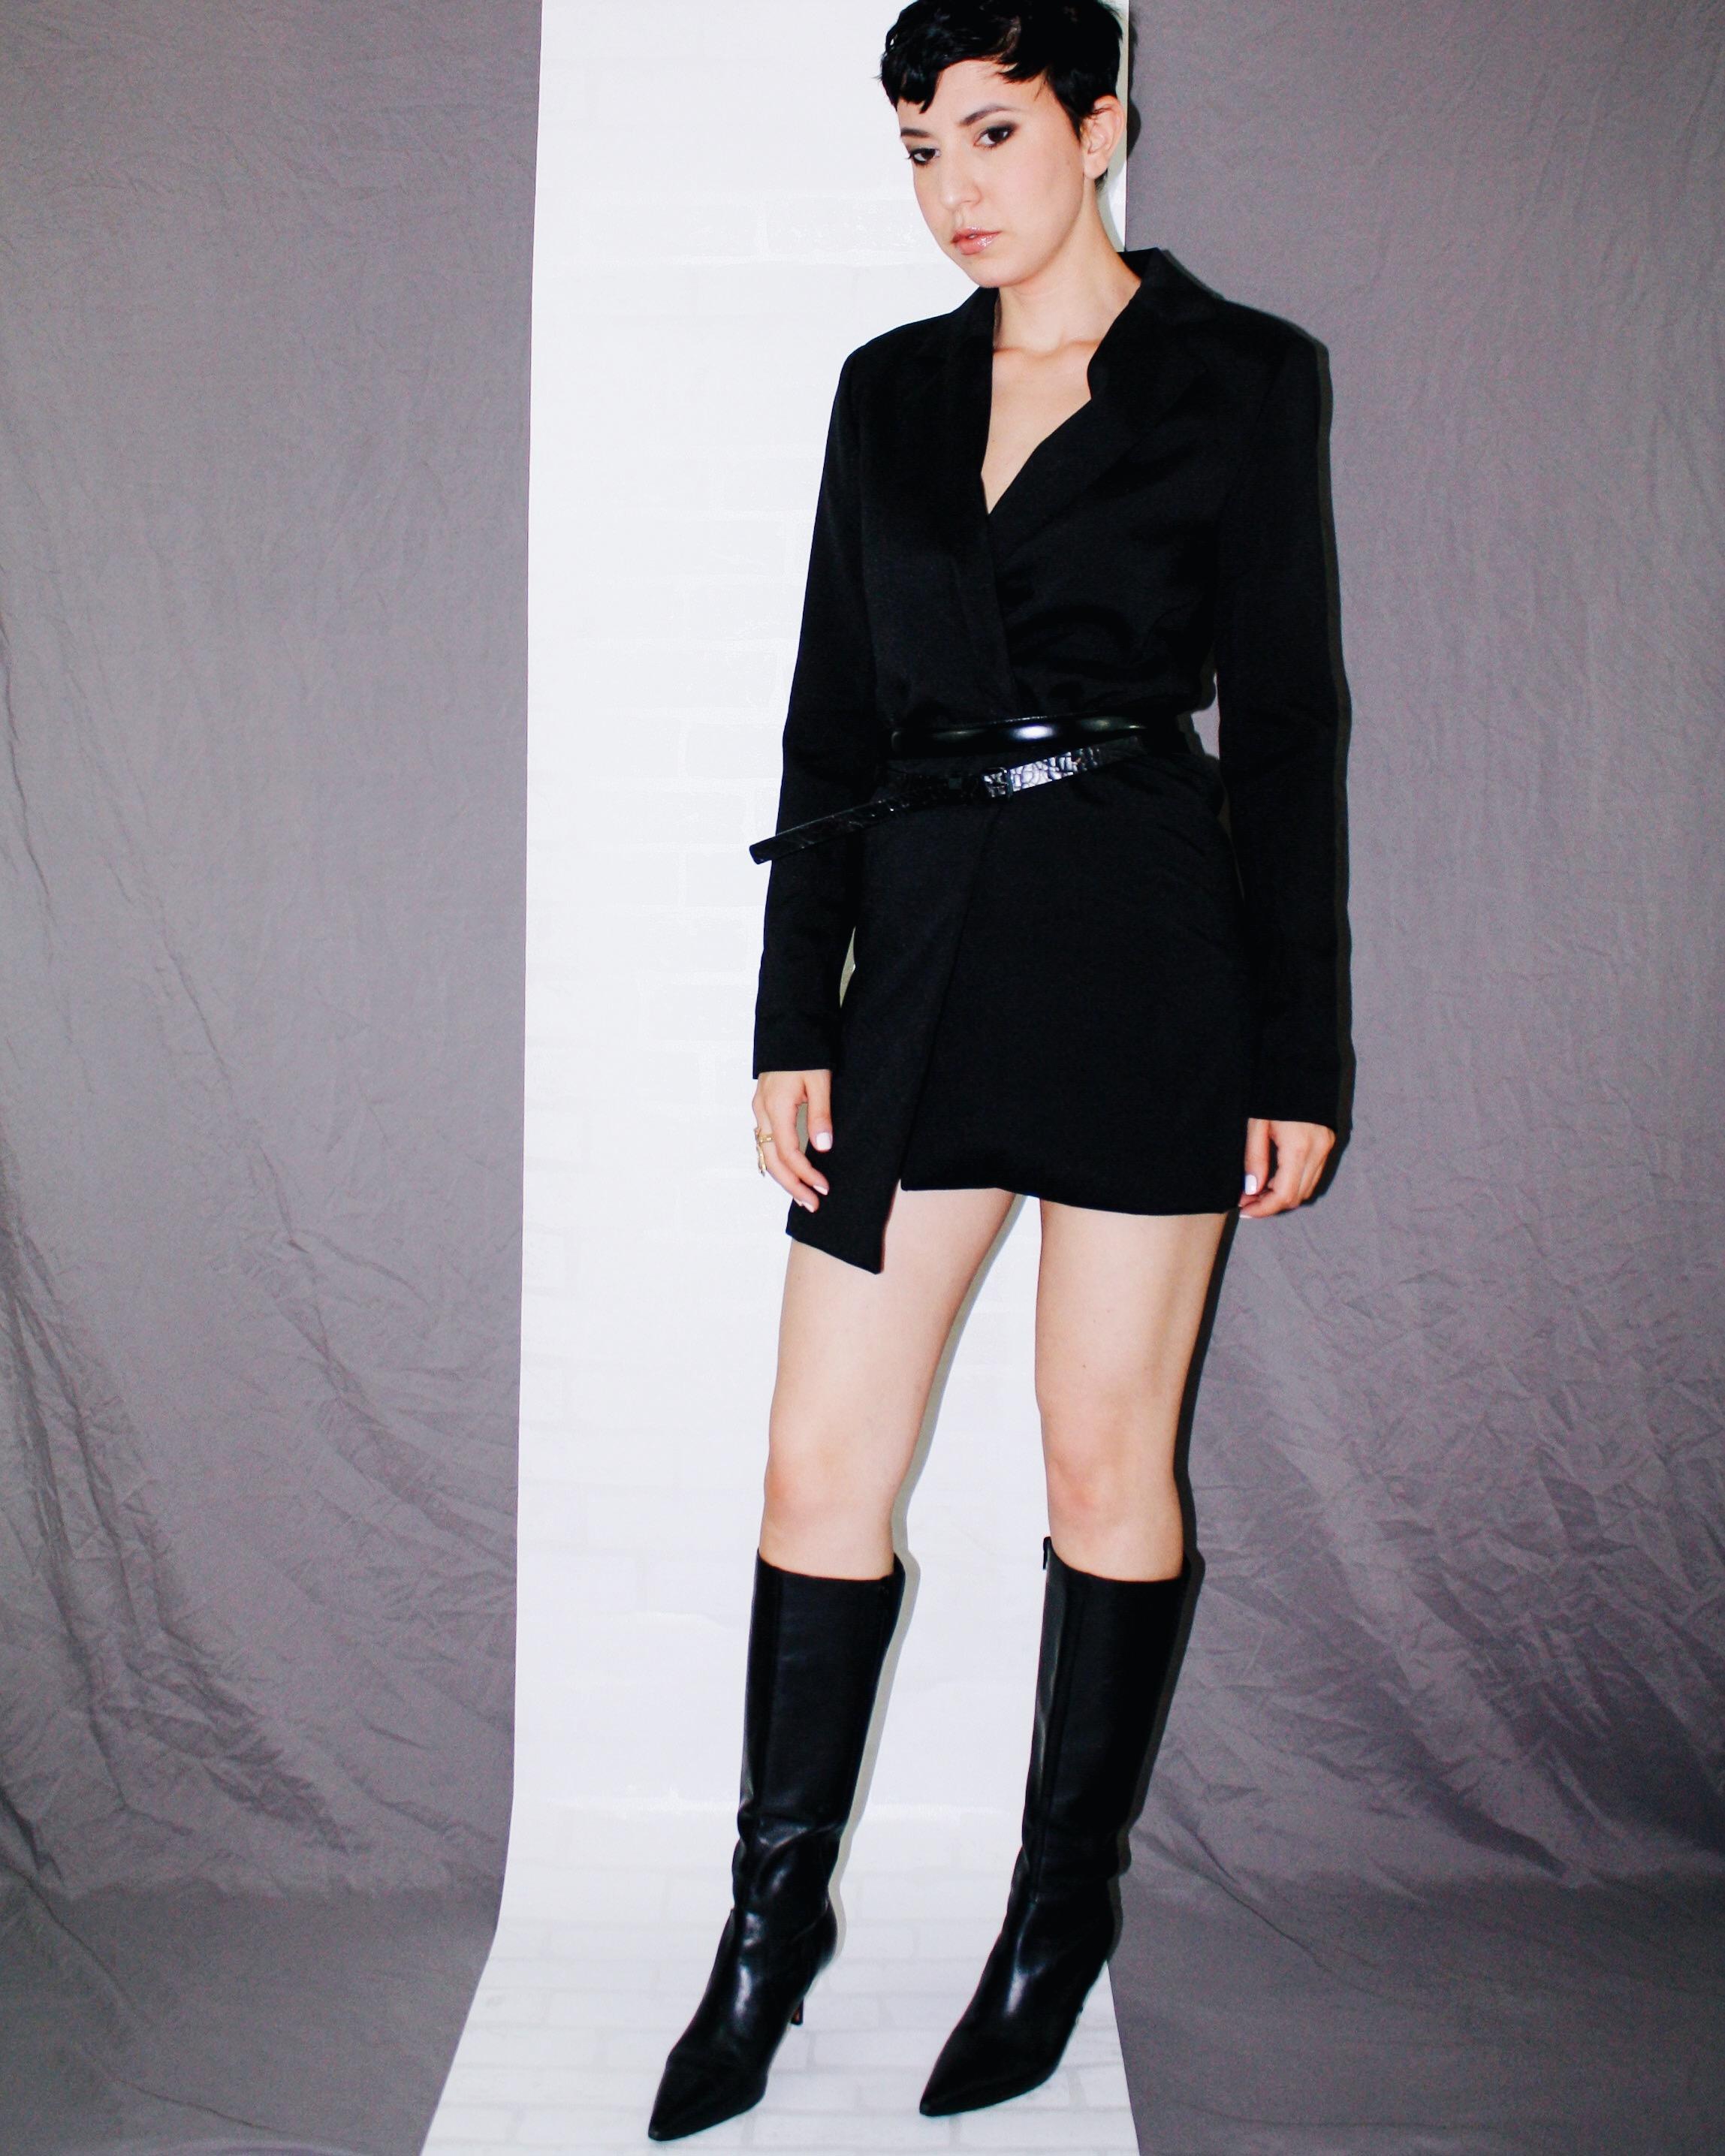 fall is here boots leather helmut lang blazer dress belts black 7